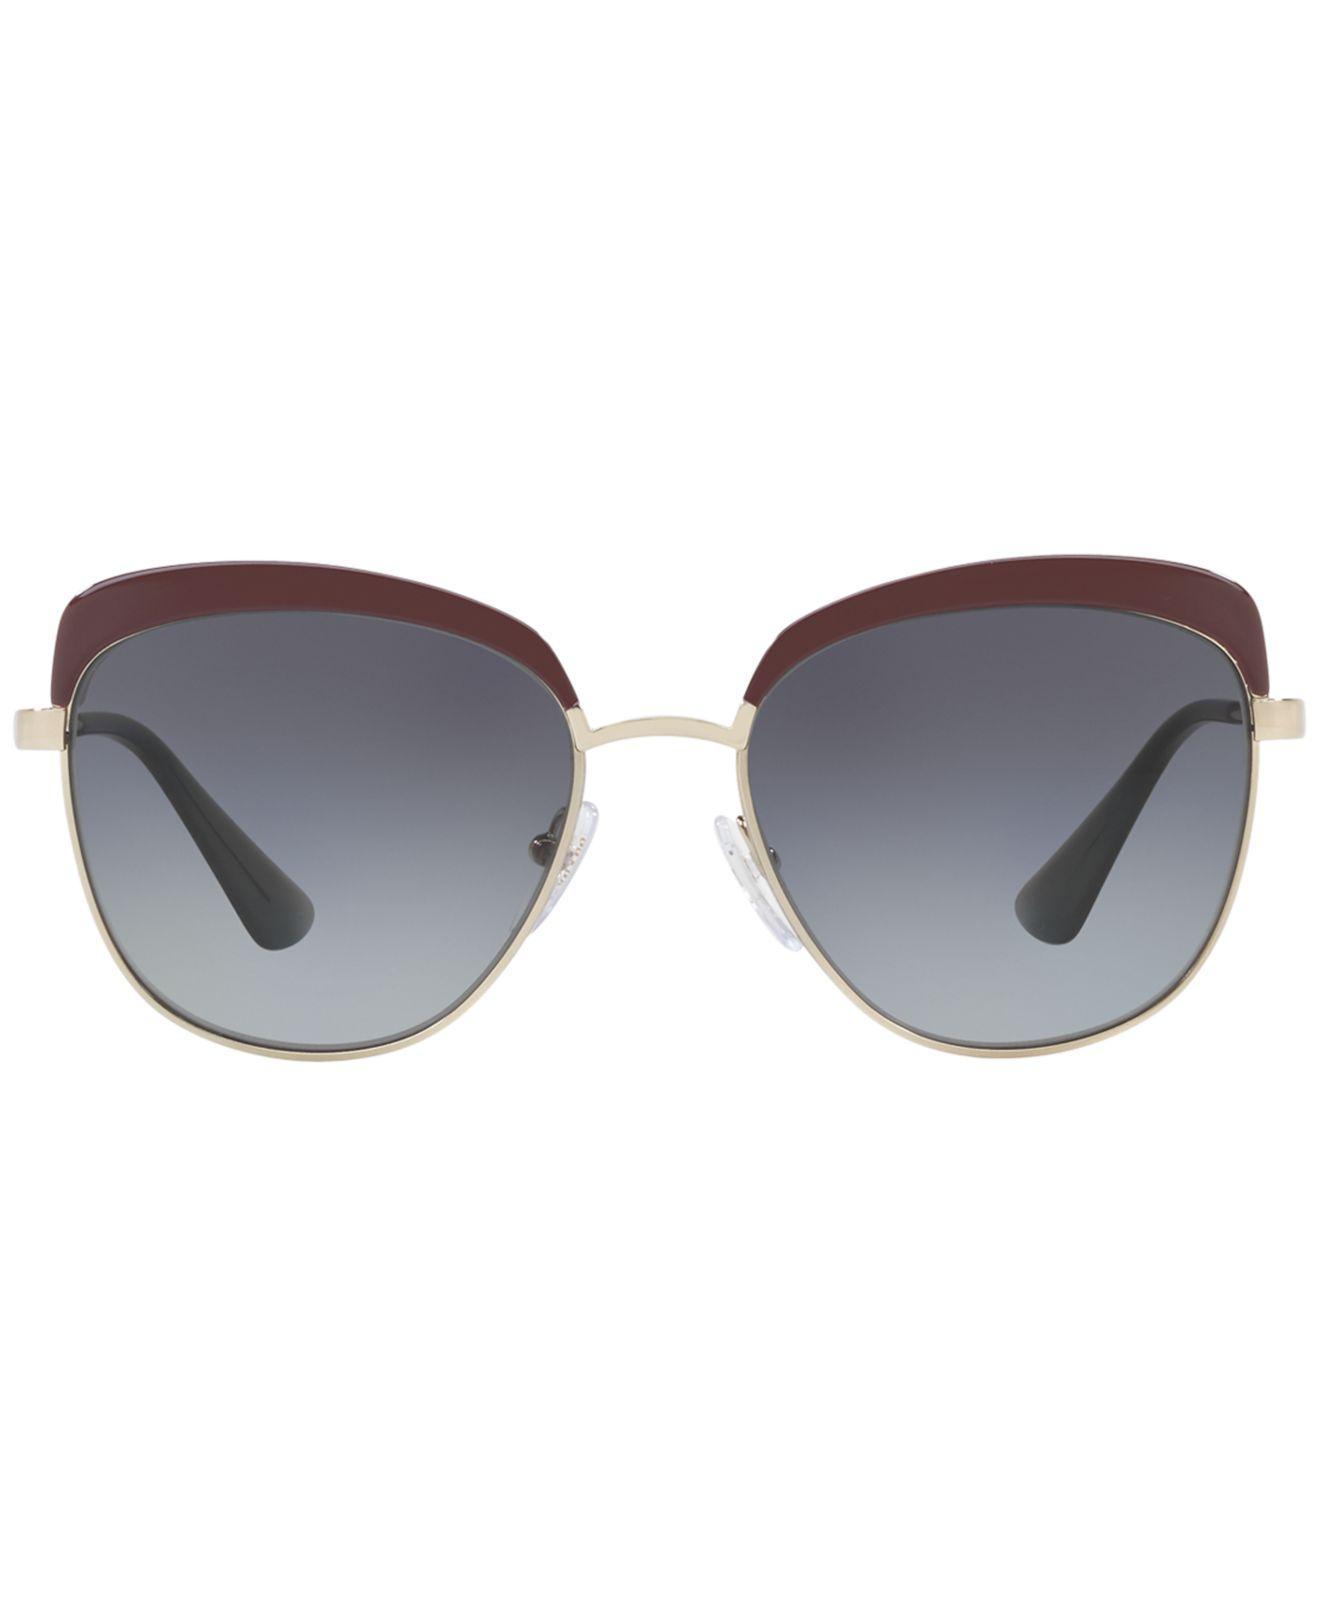 699f6433b294 ... canada lyst prada sunglasses pr 51ts in gray e60c4 41b7b new zealand prada  pr 51ts antique gold ...